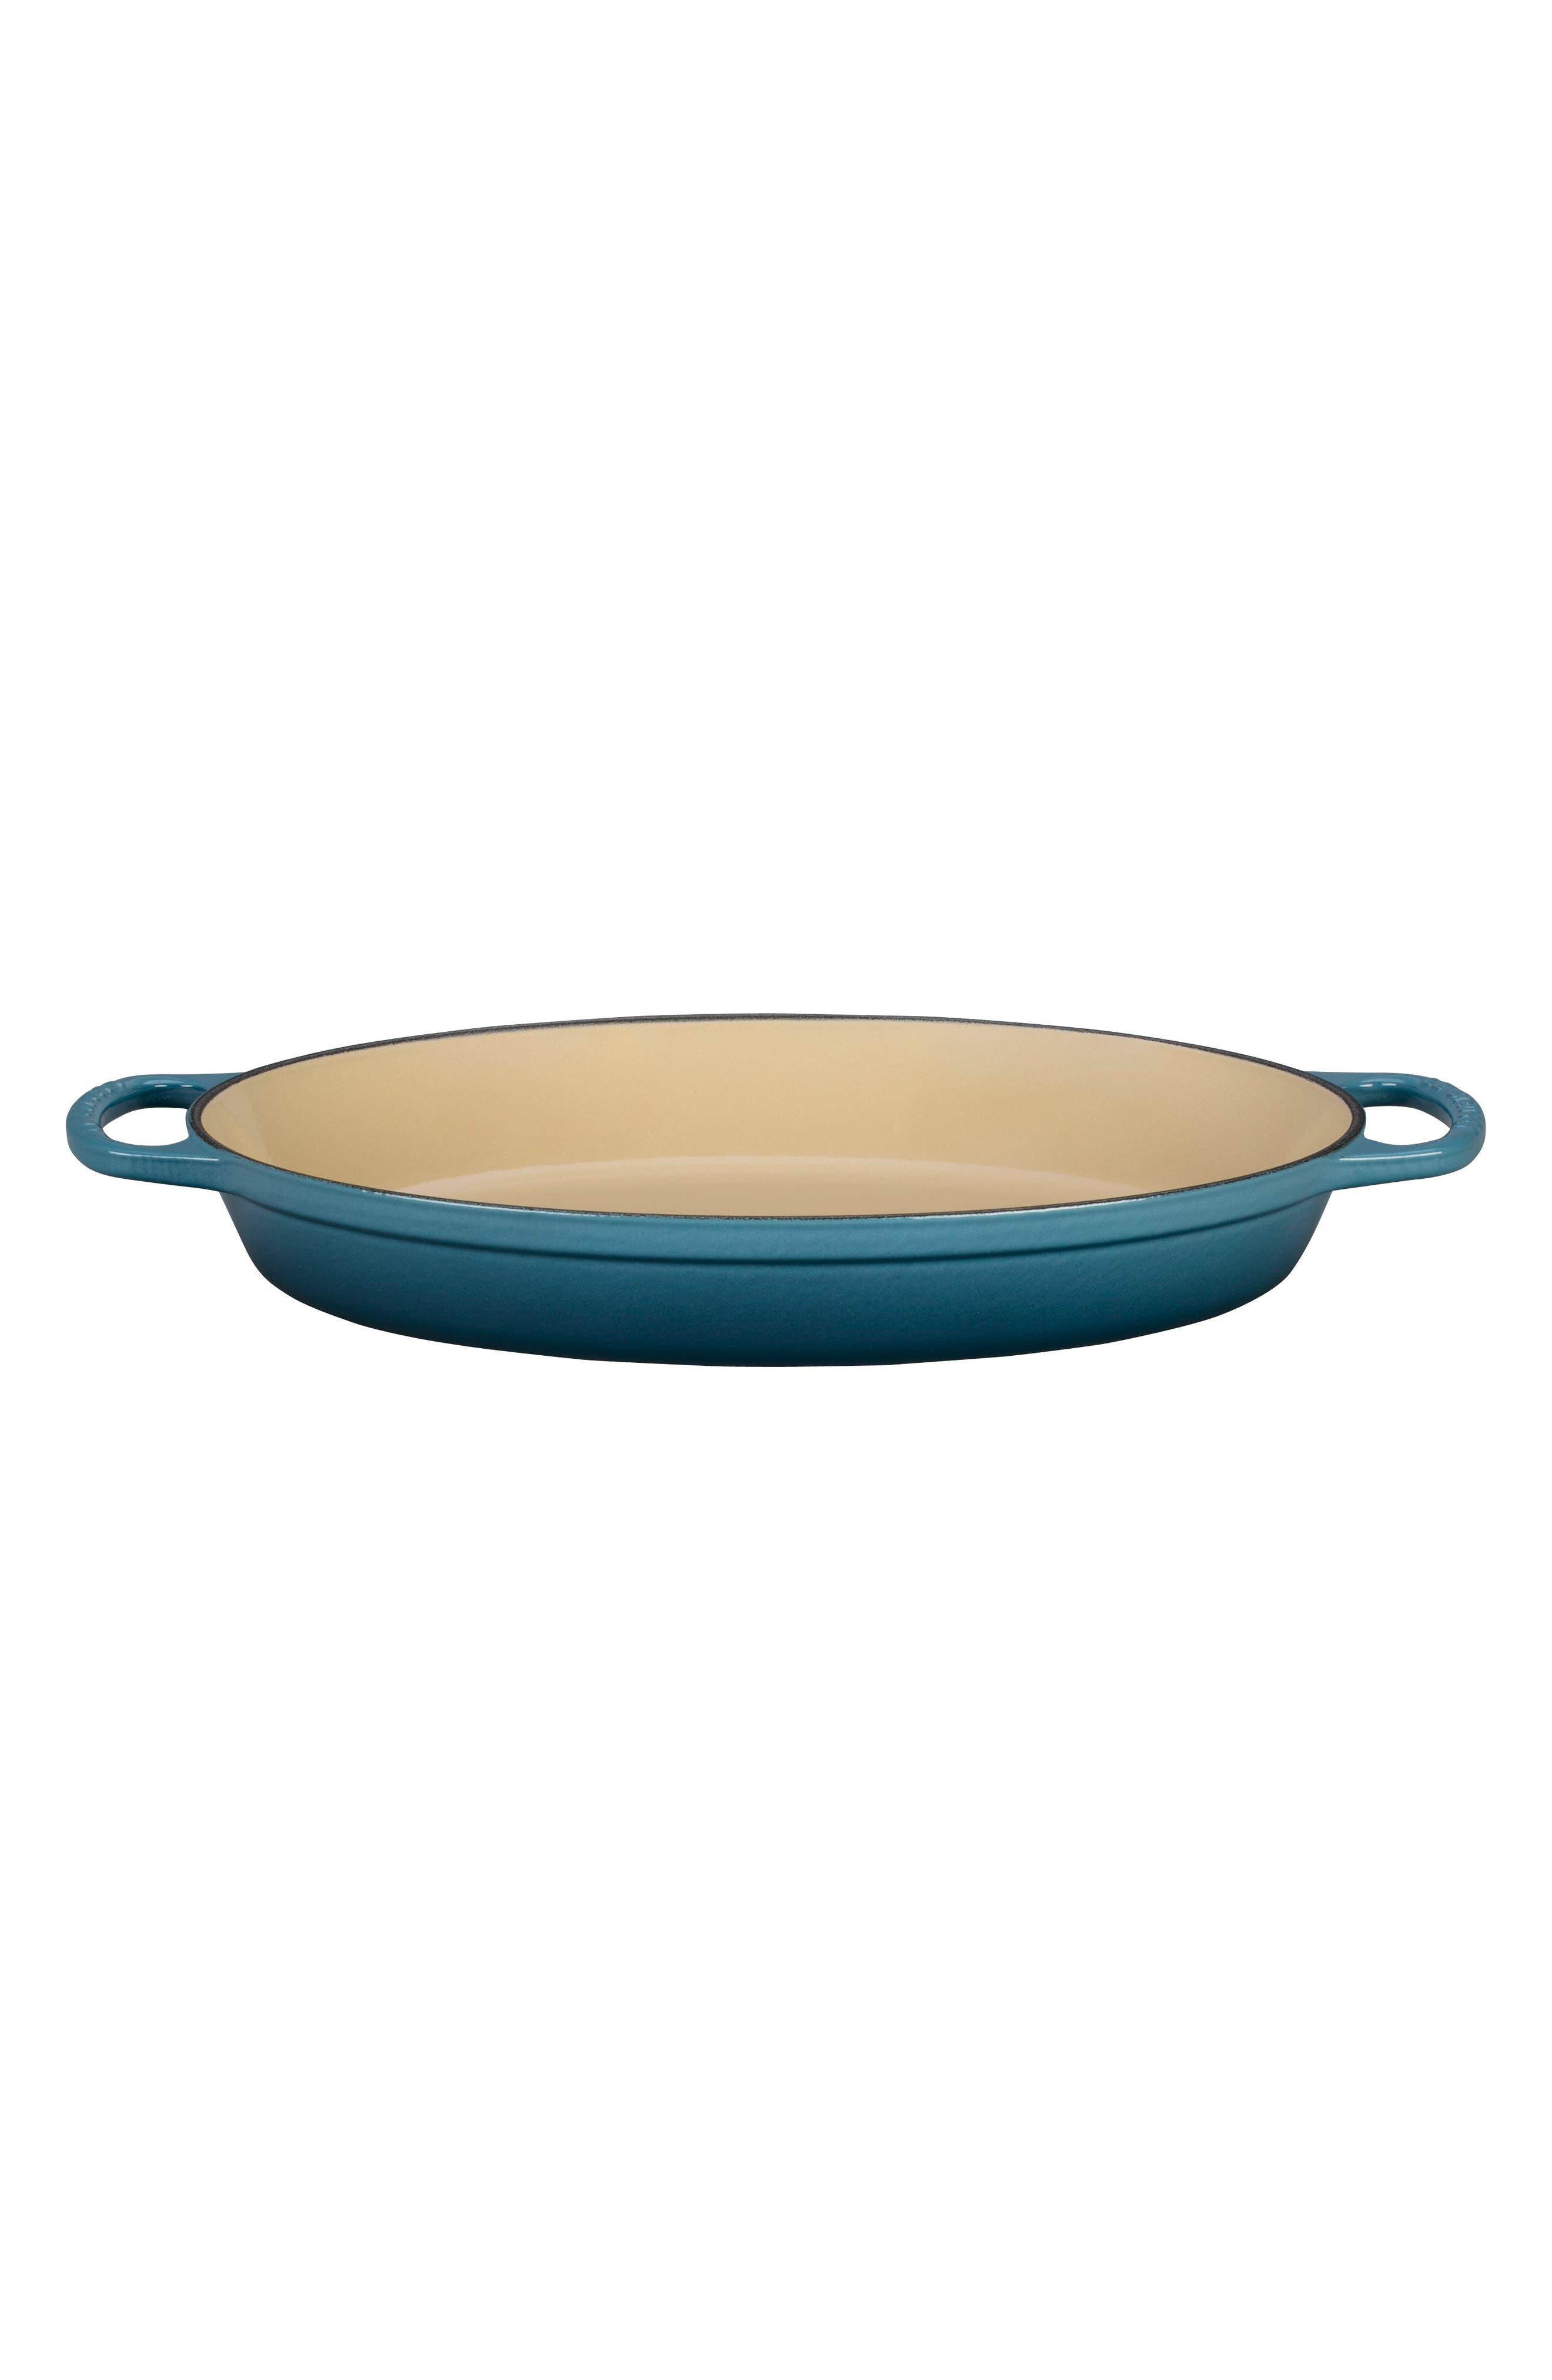 Le Creuset 2.25-Quart Enameled Cast Iron Oval Baker